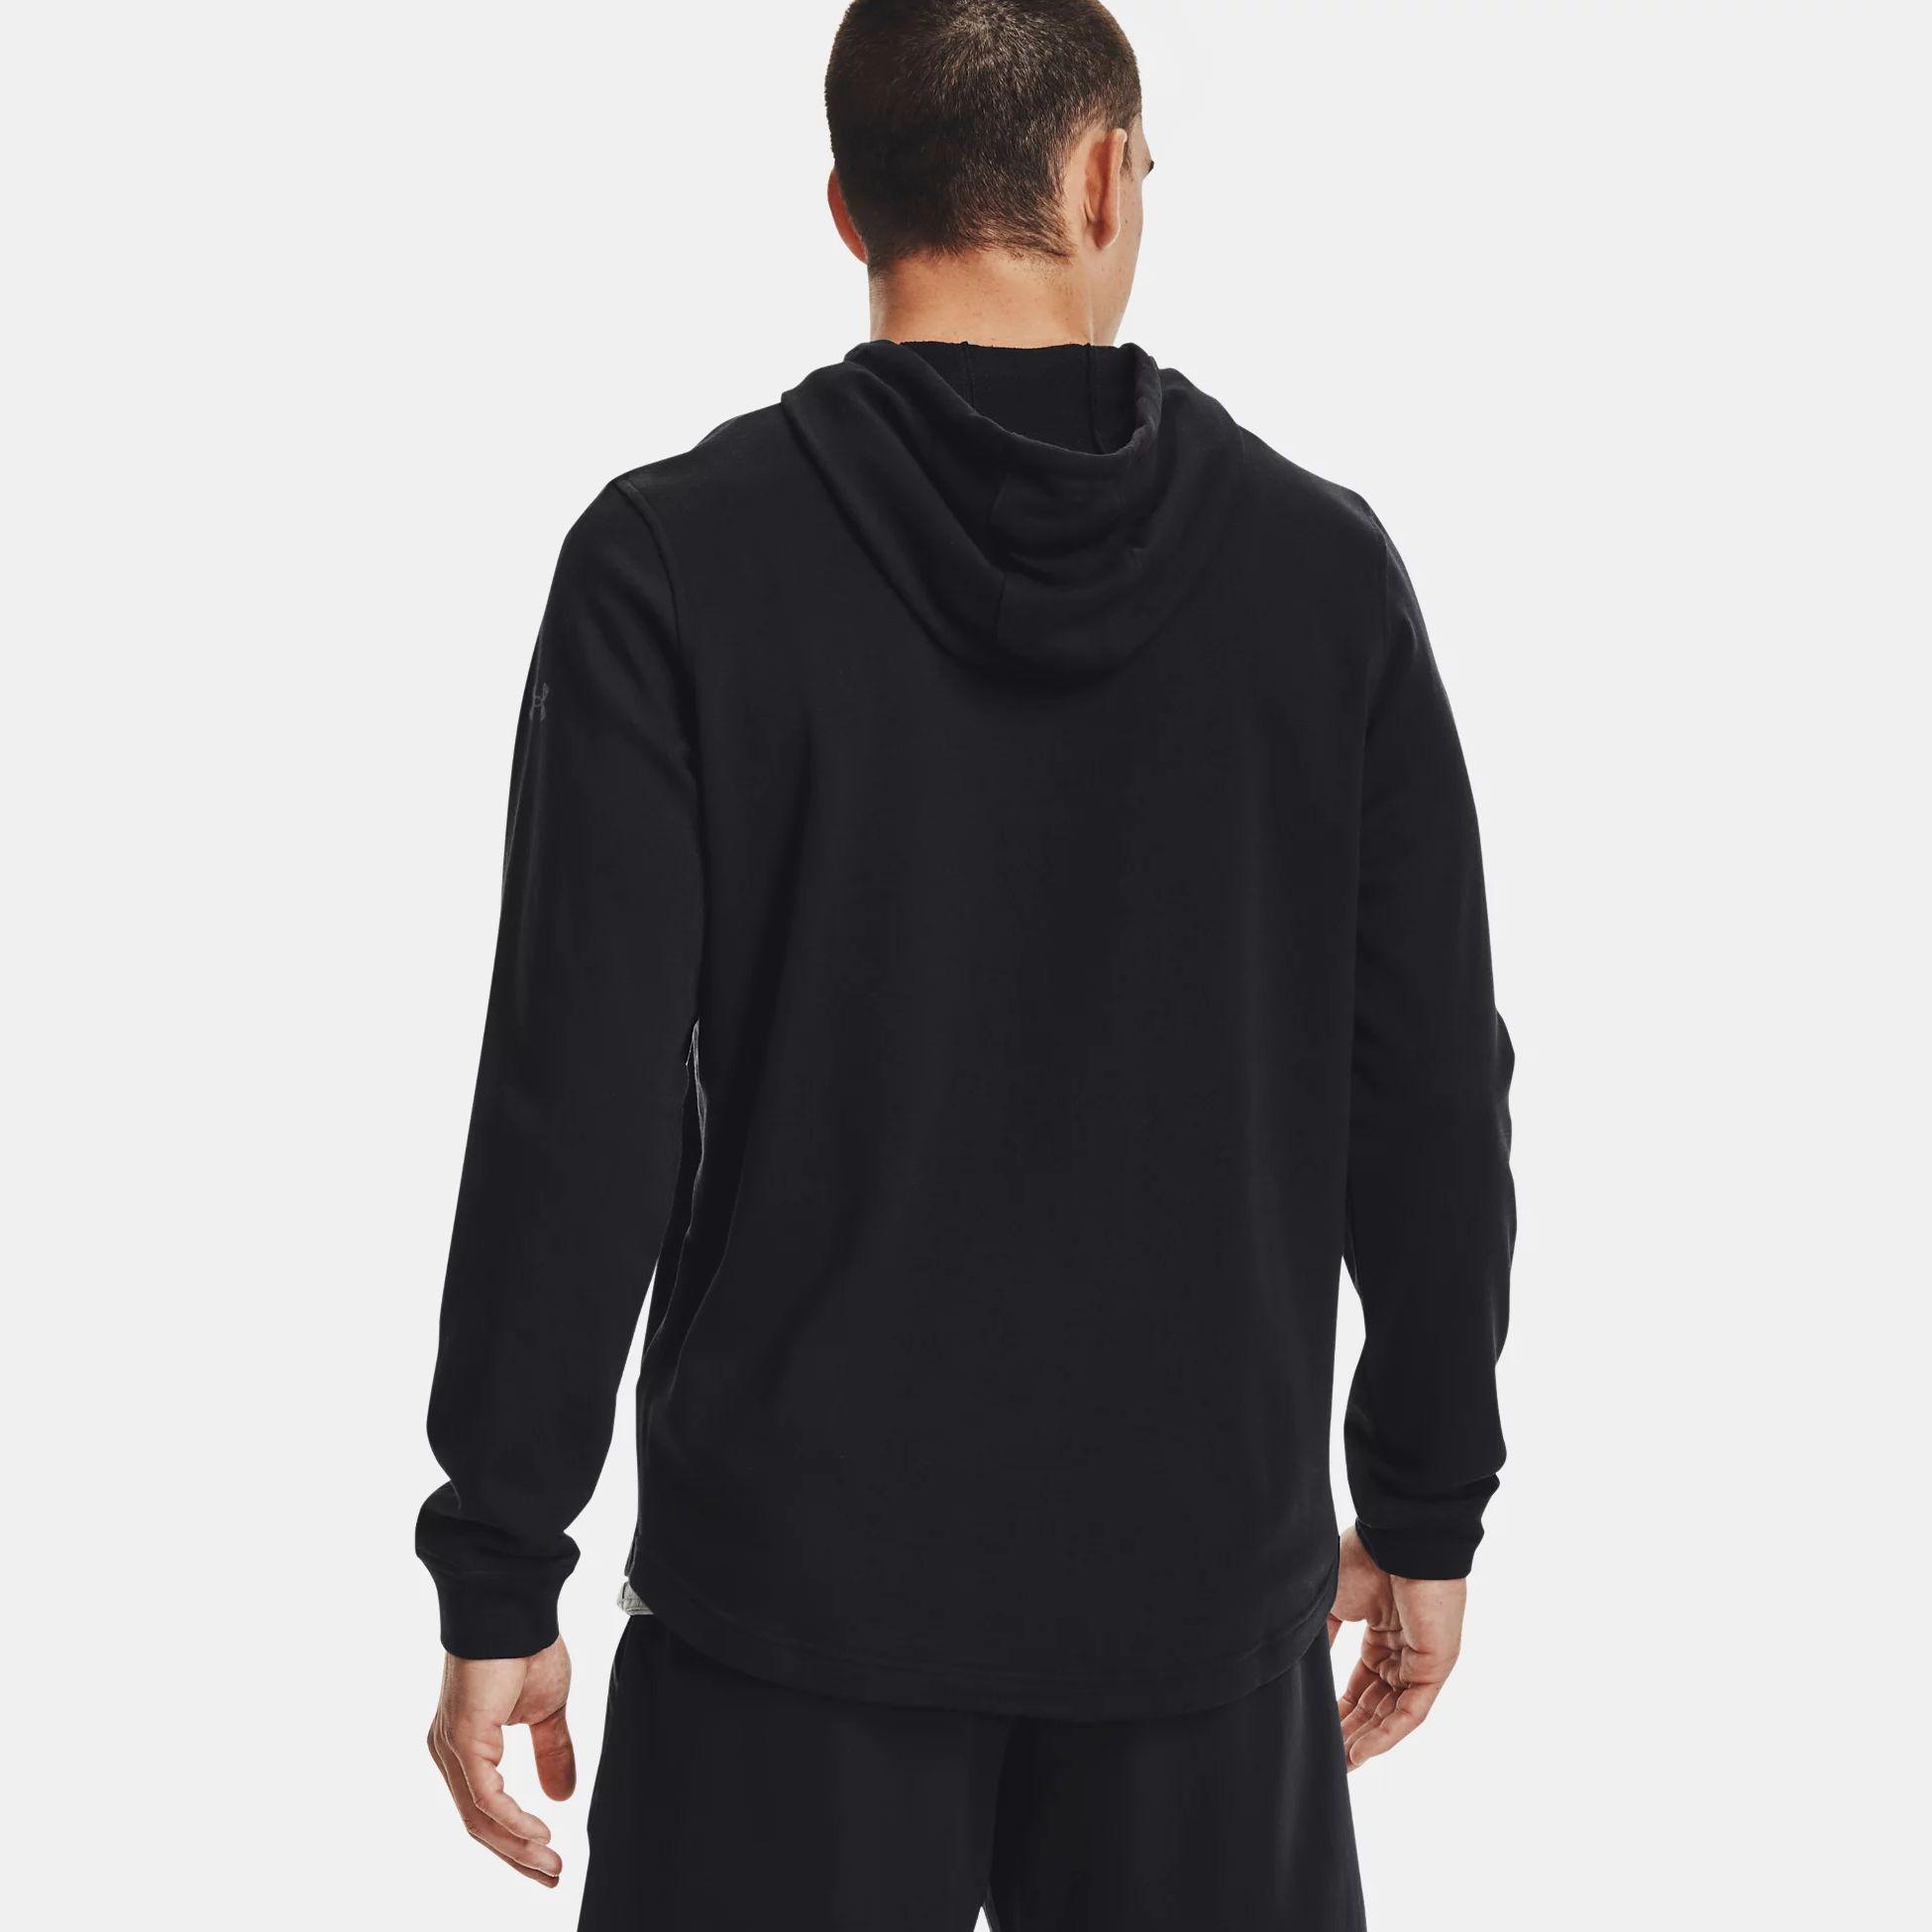 Îmbrăcăminte -  under armour Project Rock Terry BSR Hoodie